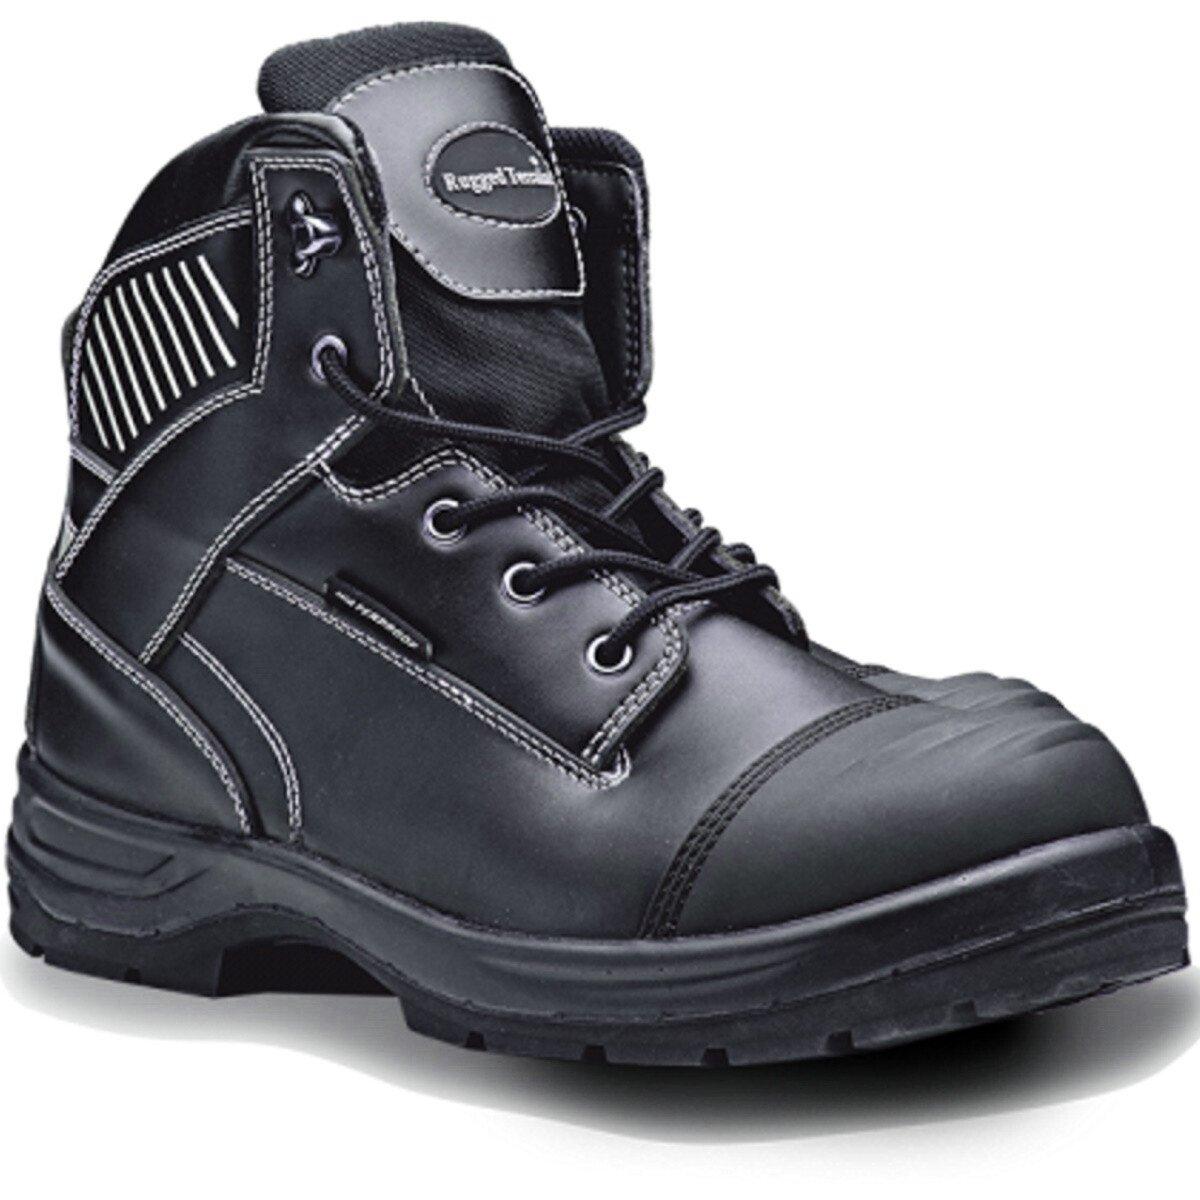 Rugged Terrain RT820B Black Waterproof Derby Leather Boot with Scuff Cap S3 WRU HRO SRC